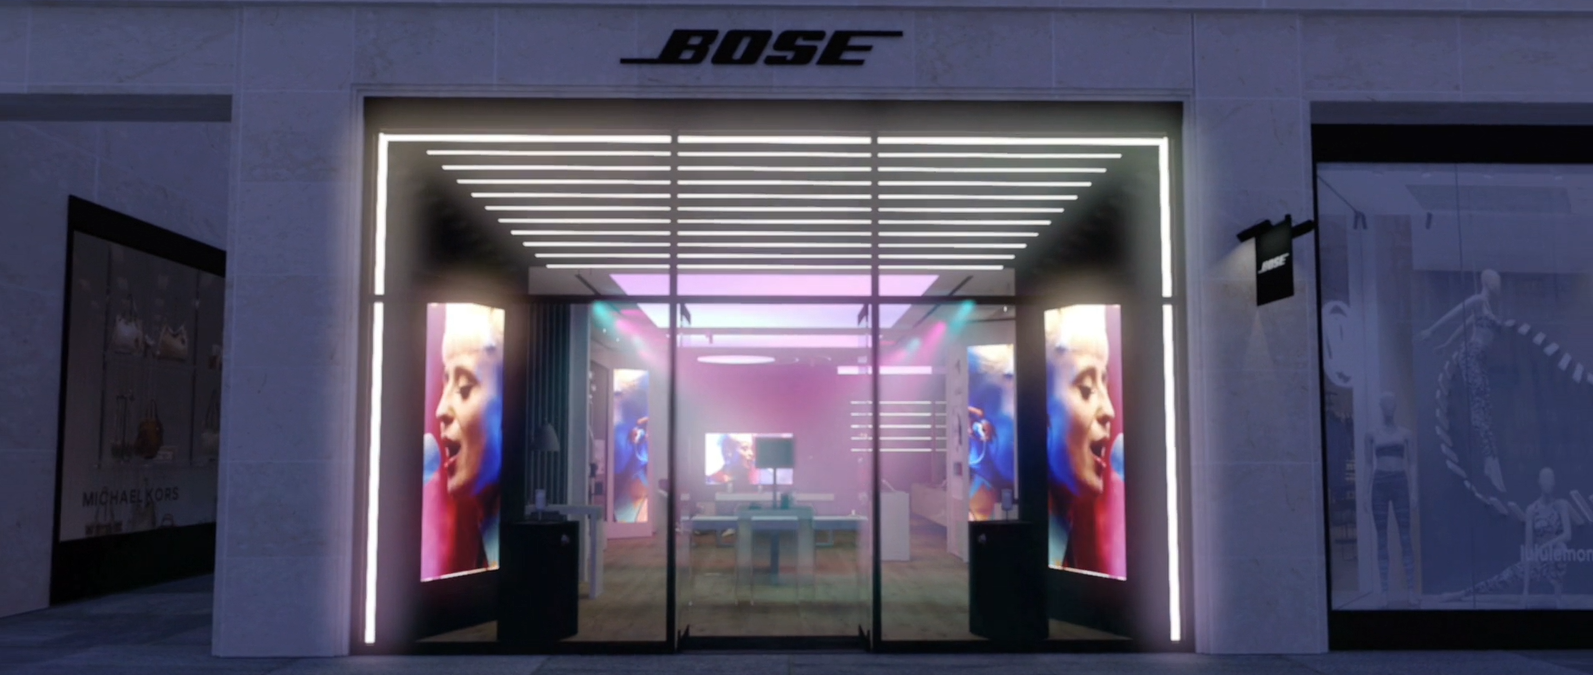 Bose, the imaginarium by night